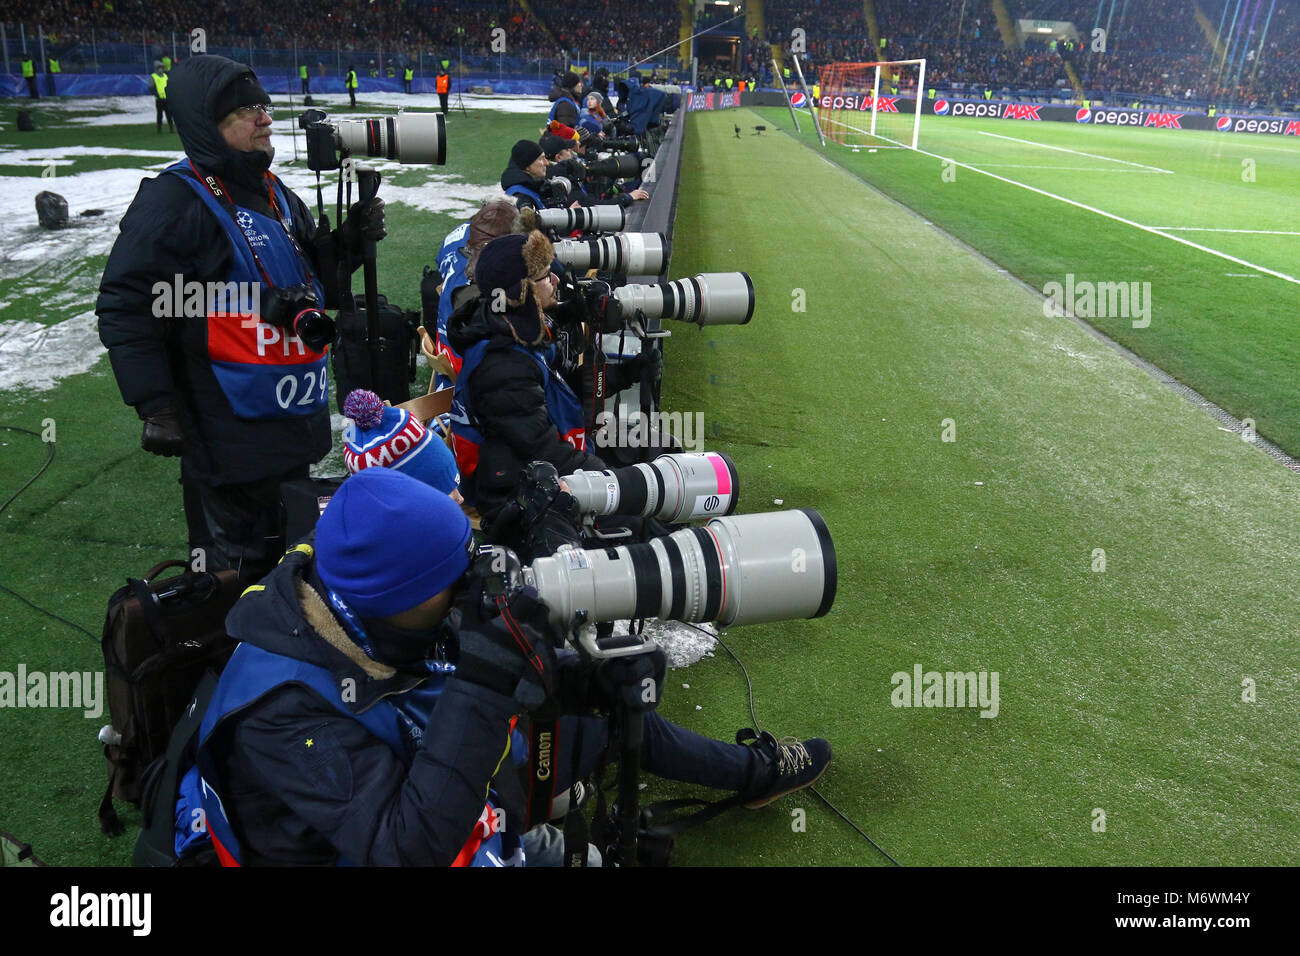 Charkow Ukraine 21 Februar 2018 Fussball Fotografen Bei